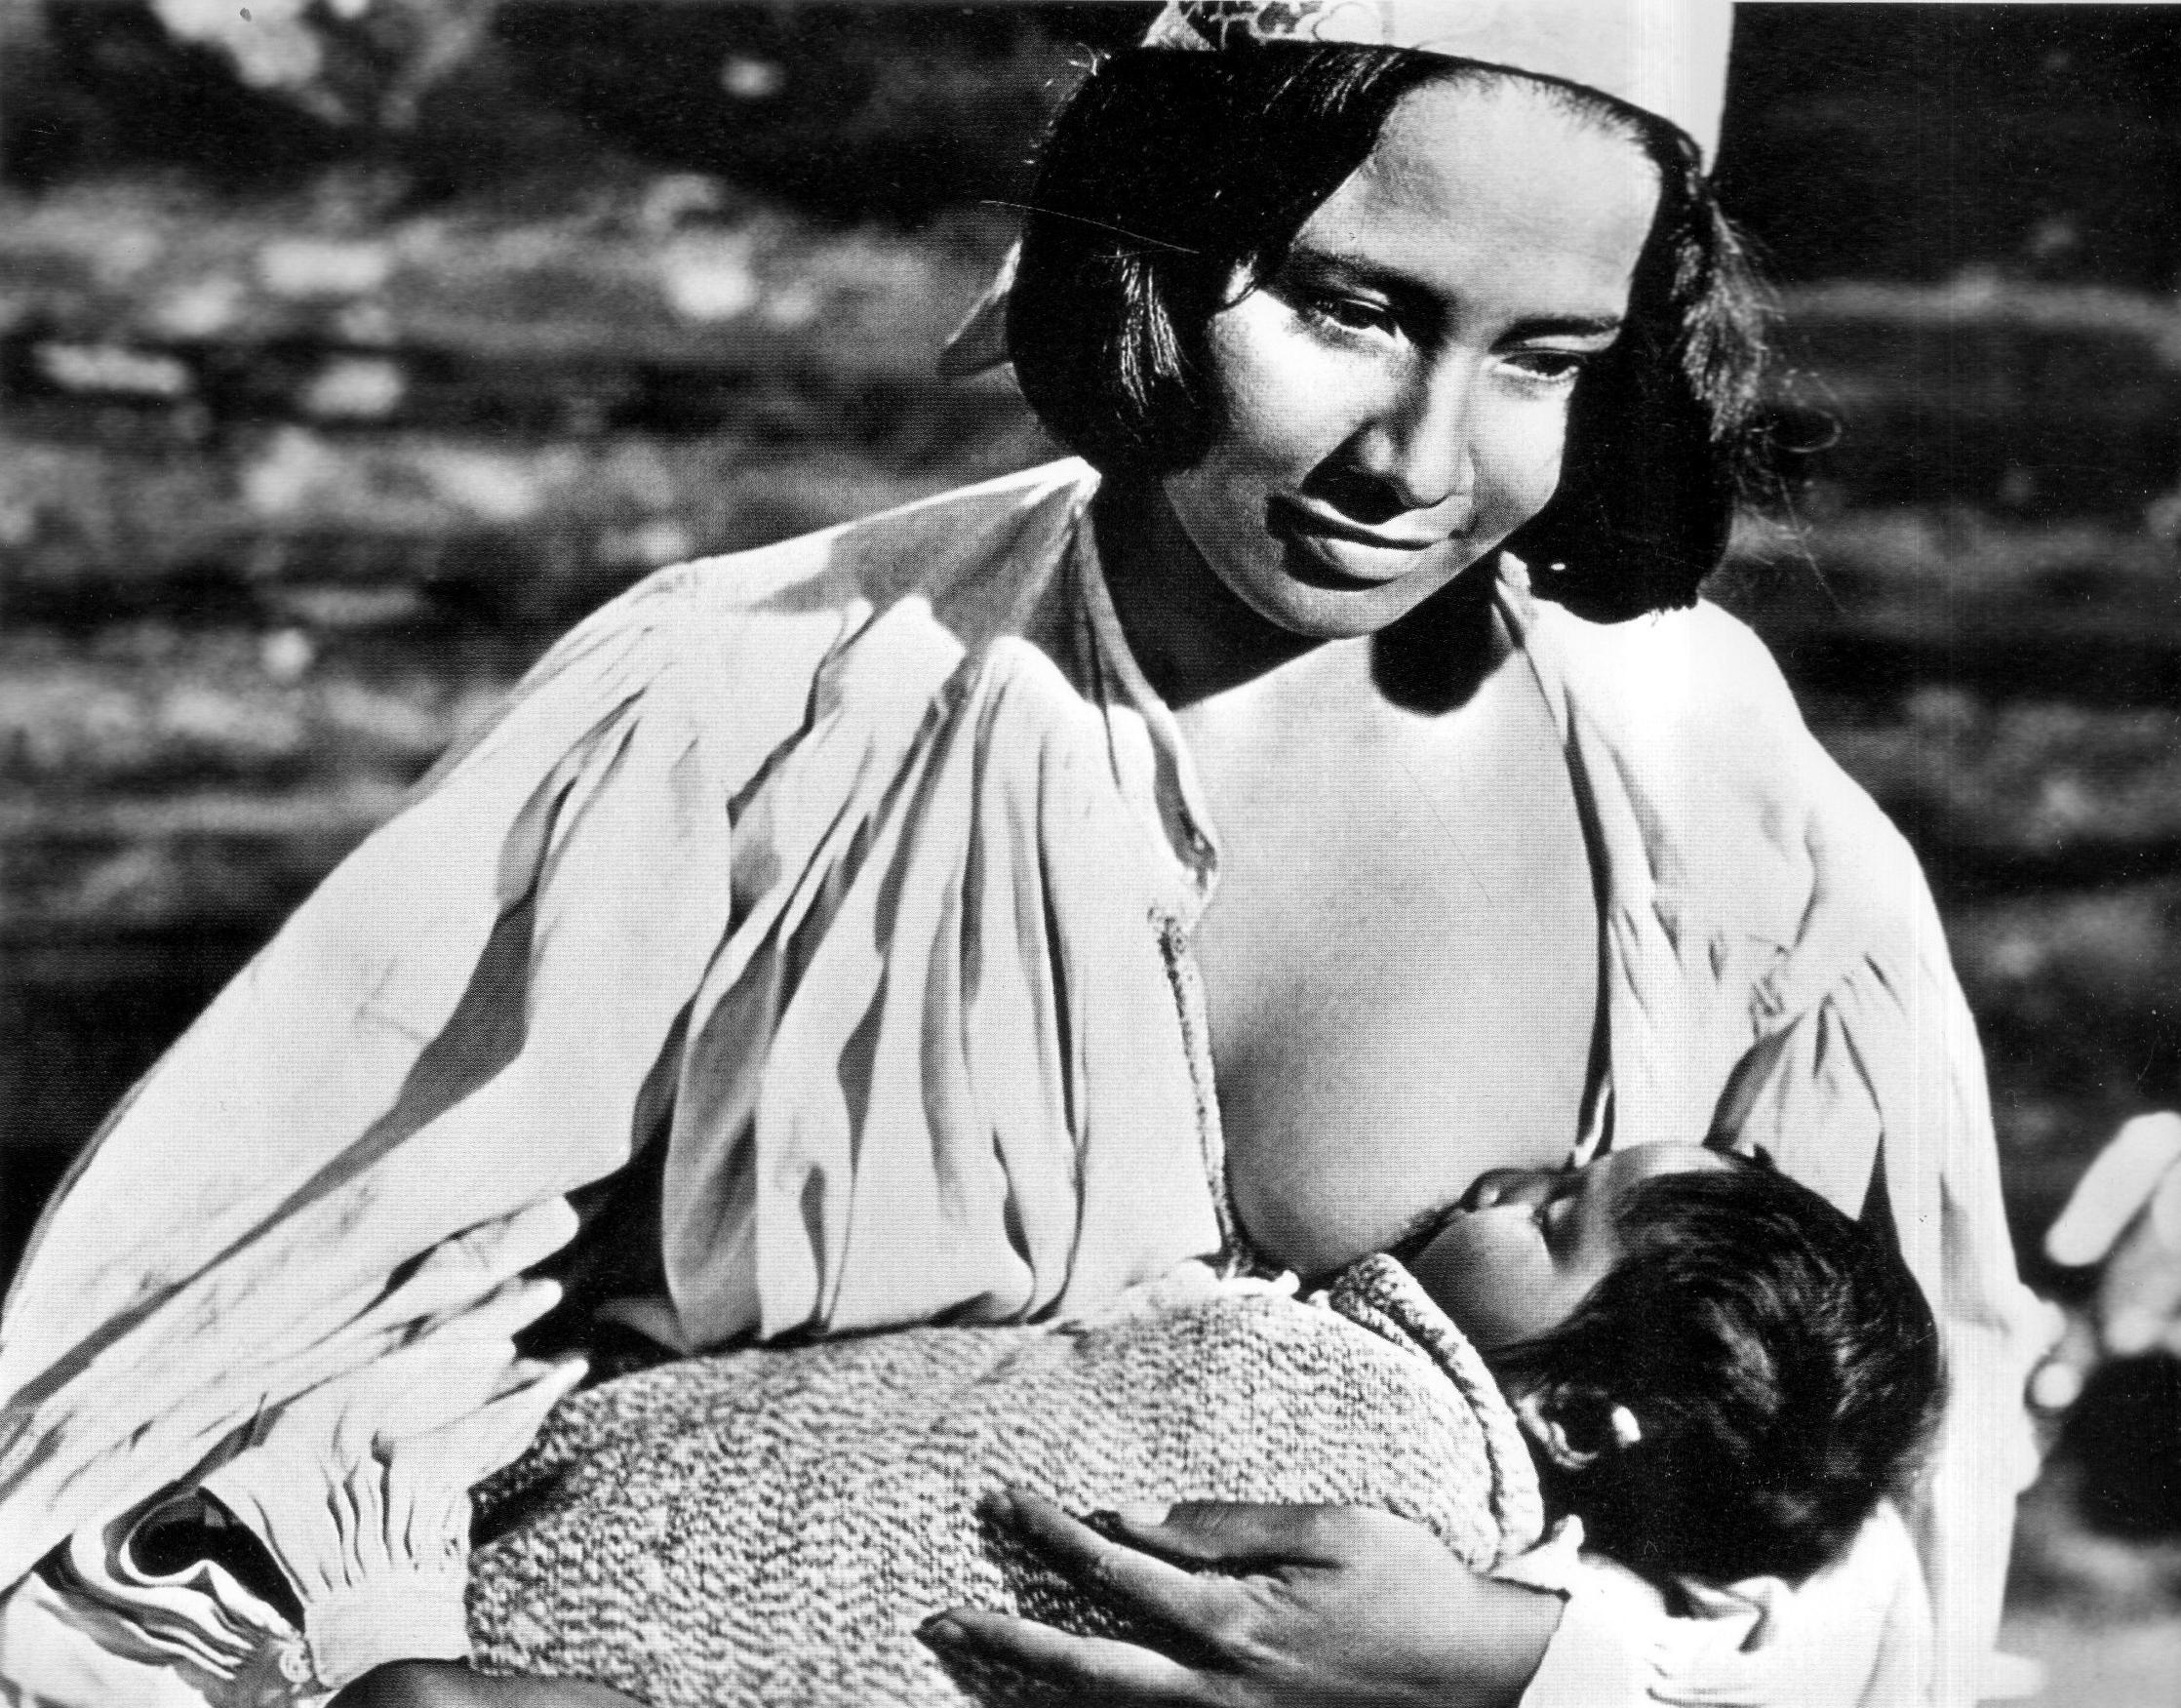 Tarahumara (Cada vez más lejos) (1965)